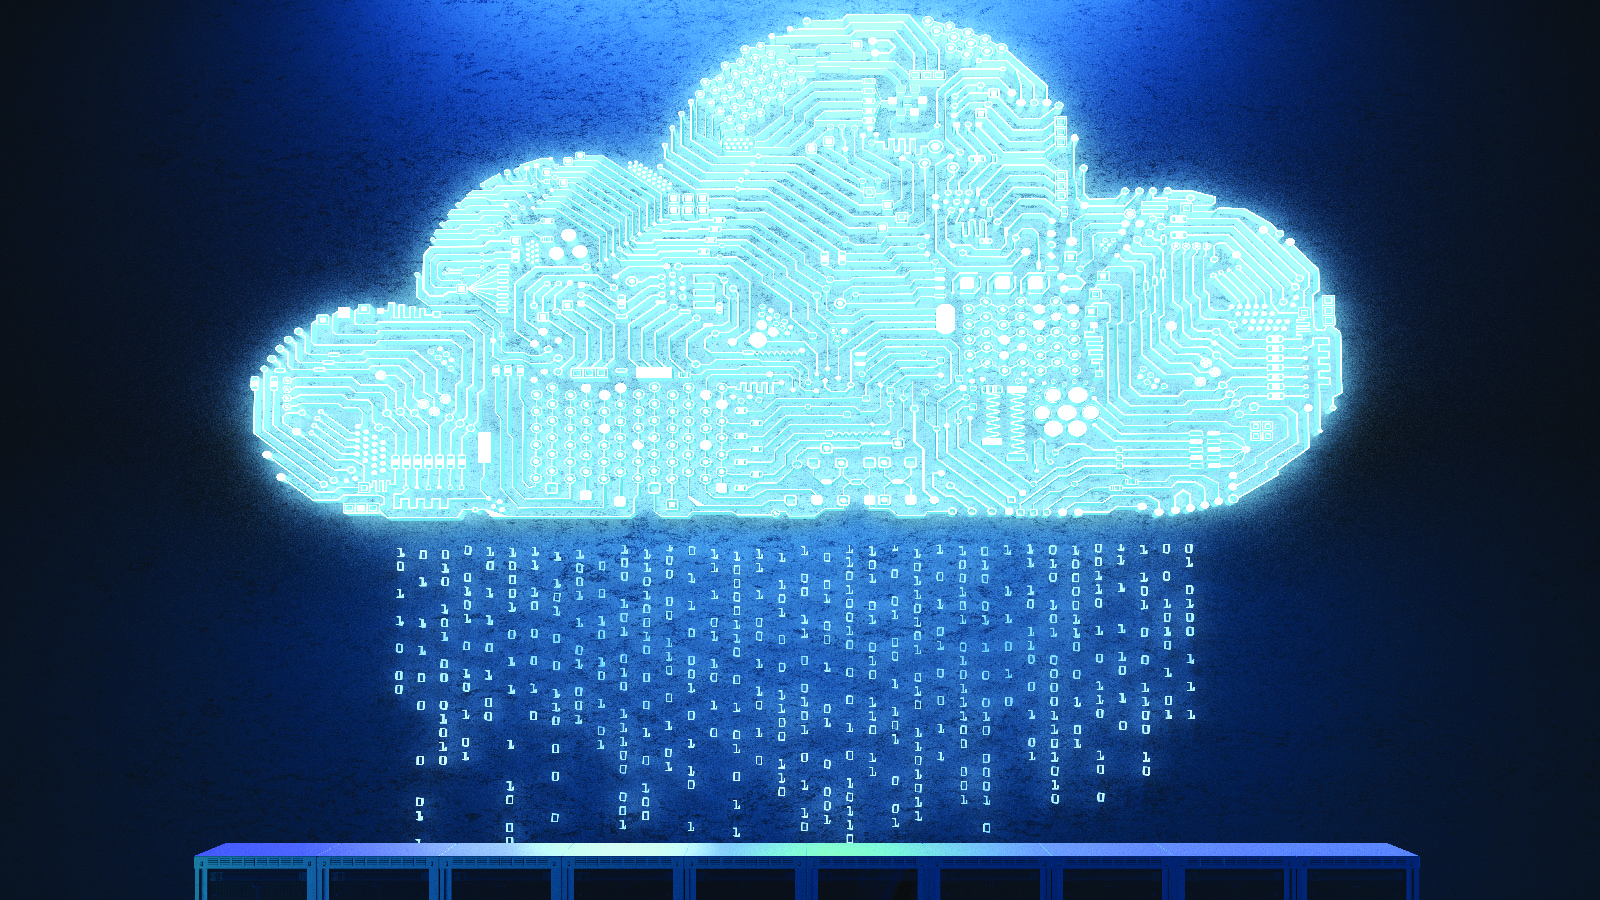 Cloud, Cloud Adoption, Cloud Security, Cloud Migration, Multi-cloud strategies, IaaS, Gartner, Cloud IaaS, Data Breaches, IT, Cloud Vendor CTO, CEO, CIO, Cloud, Cloud Adoption, Cloud Security, Cloud Migration, Multi-cloud strategies, IaaS